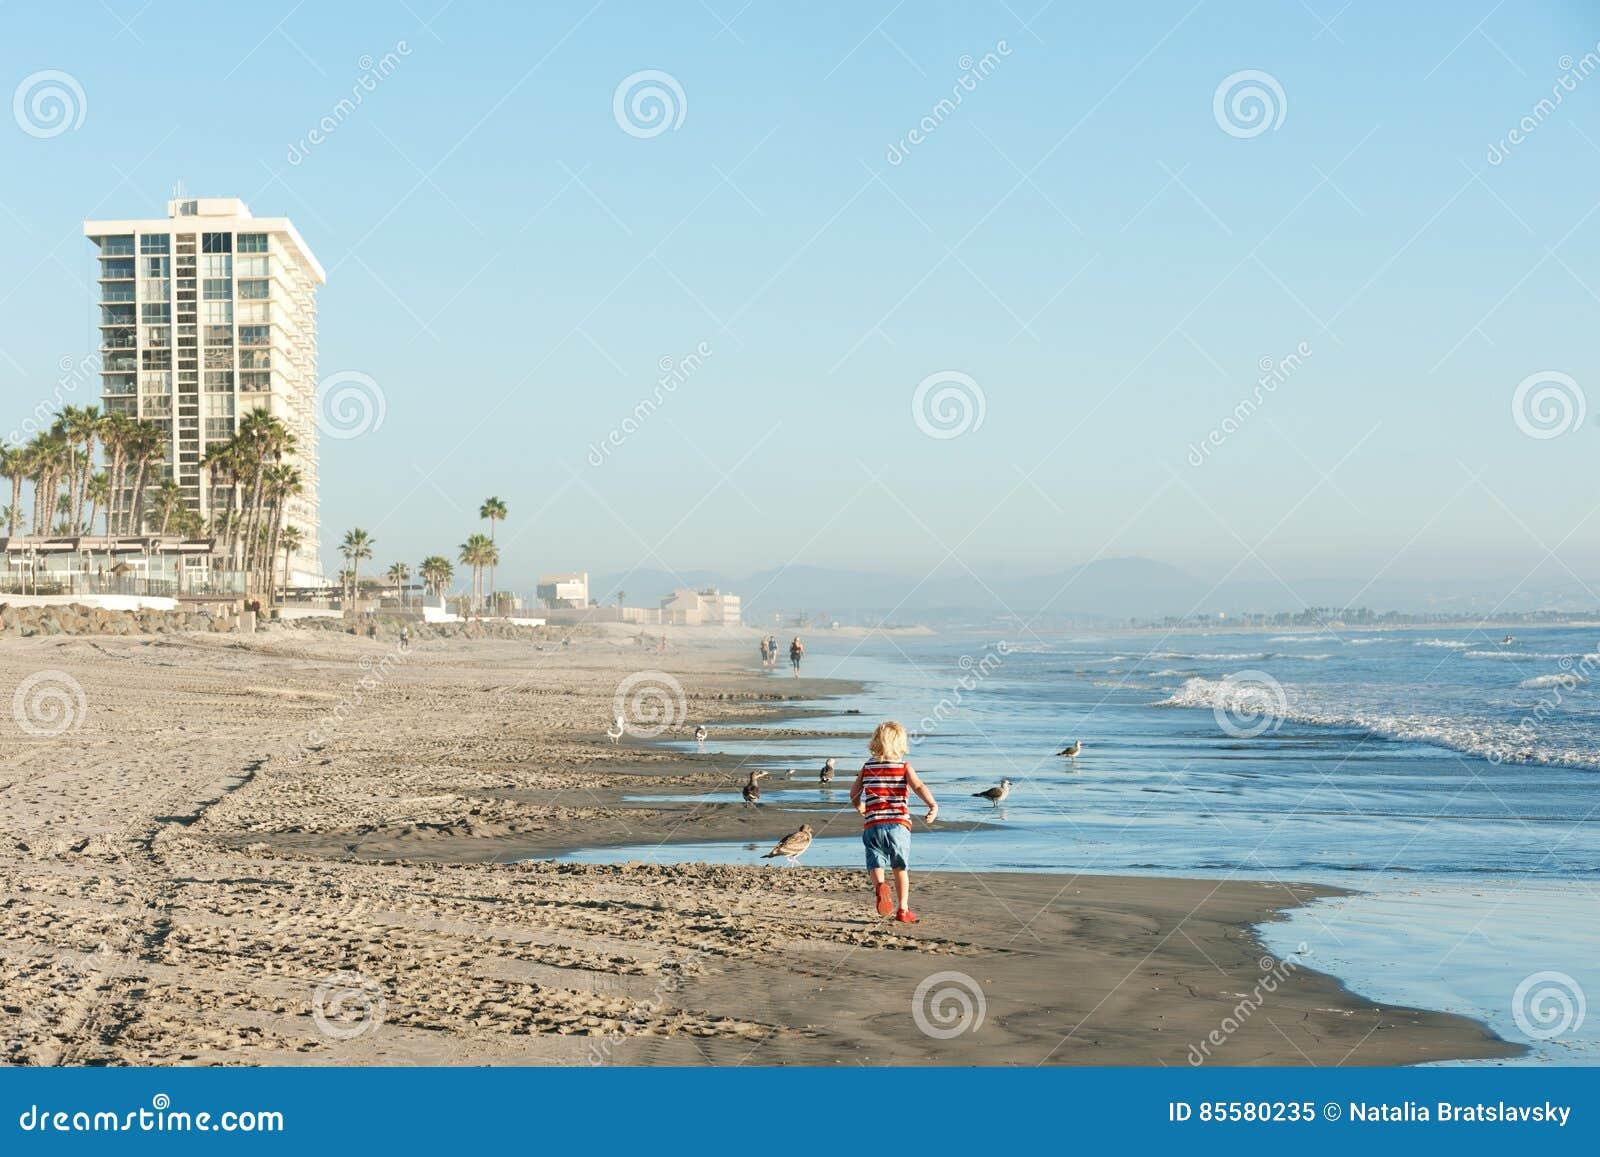 Distance From Blue Sea Beach Hotel To Coronado Beach